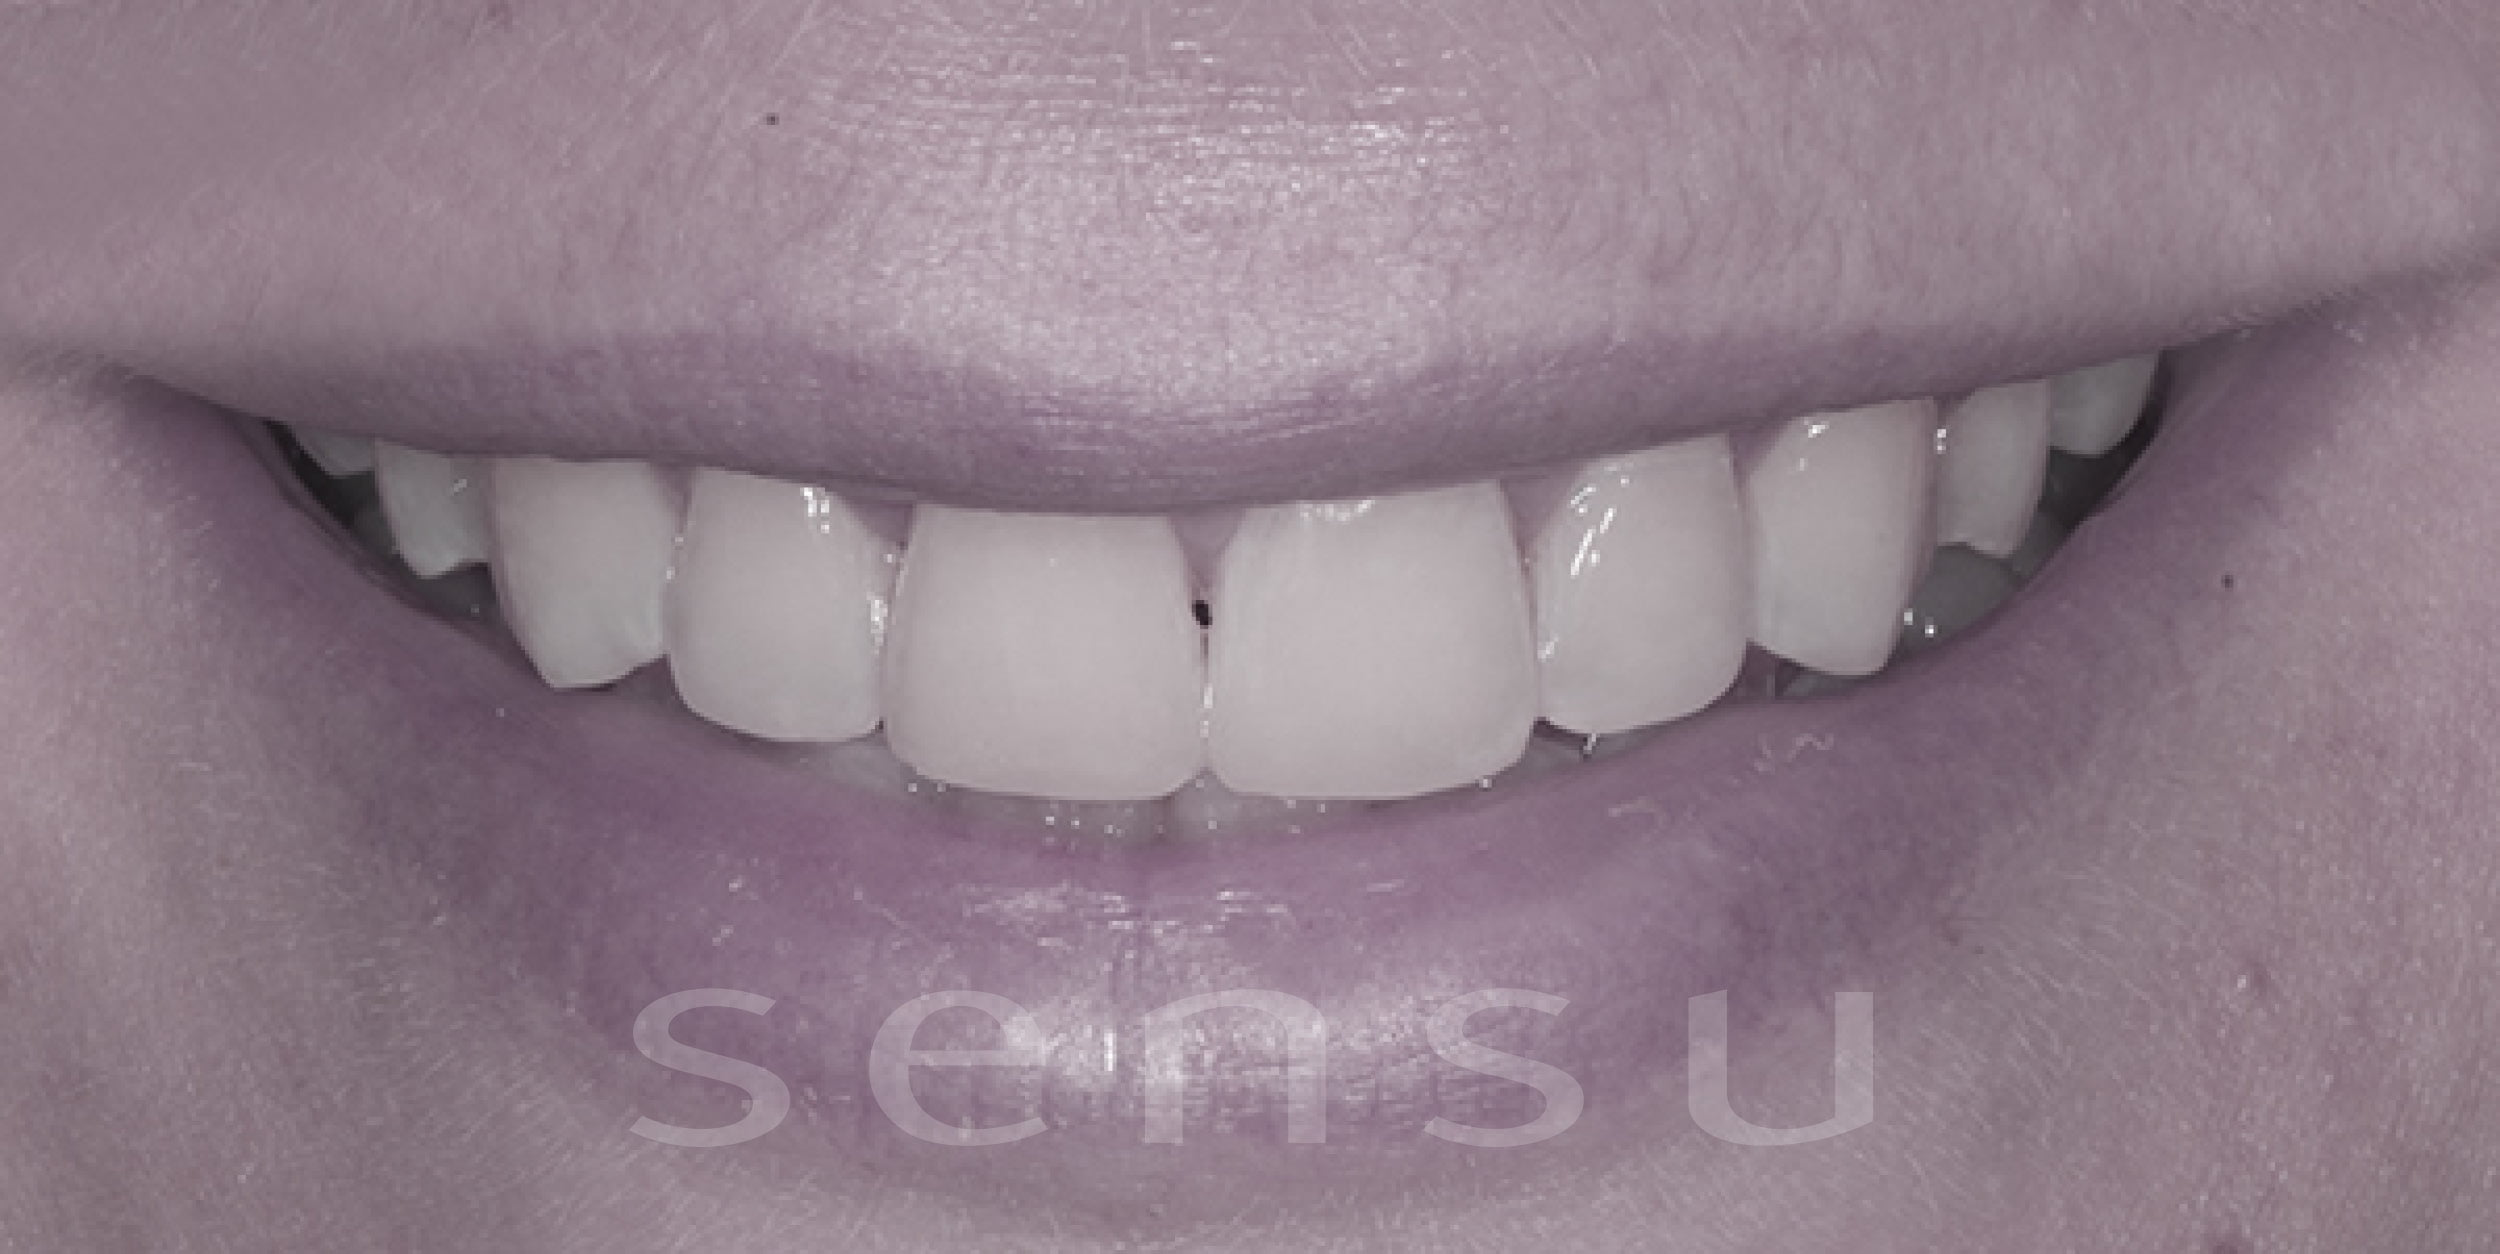 Teeth bonding after